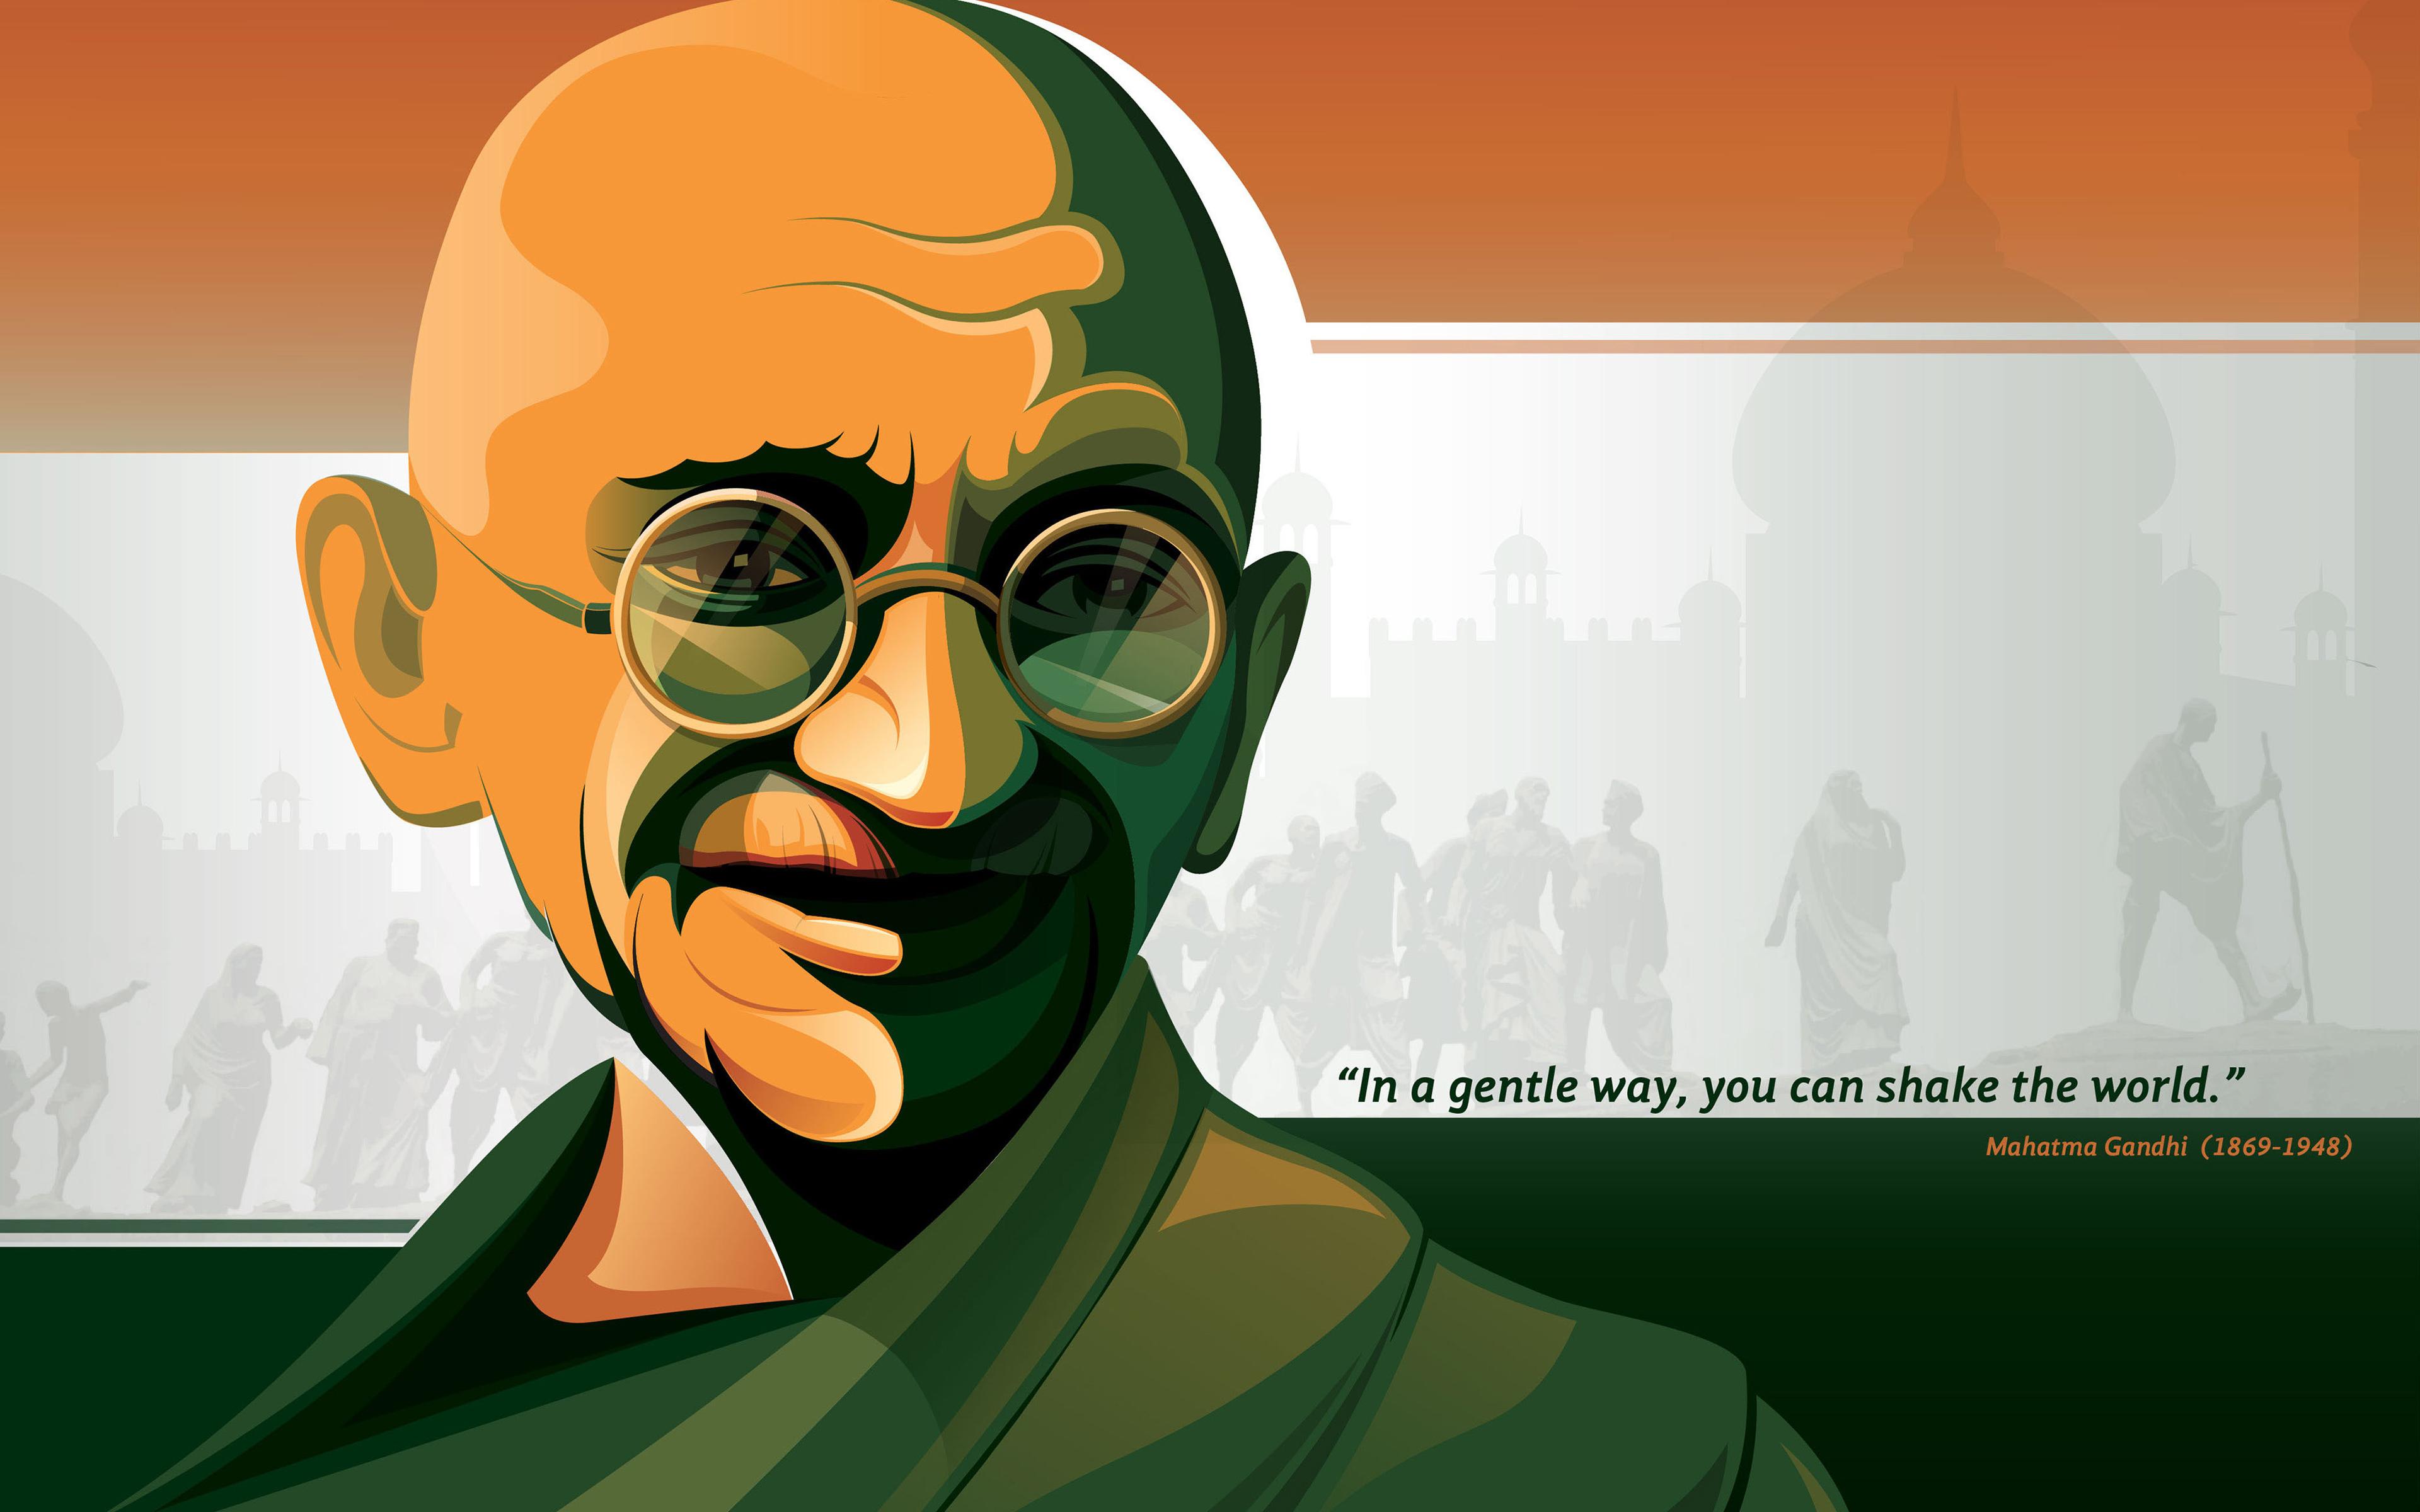 Indian Flag Animation Wallpaper Mahatma Gandhi Hd 4k Wallpapers Hd Wallpapers Id 20893